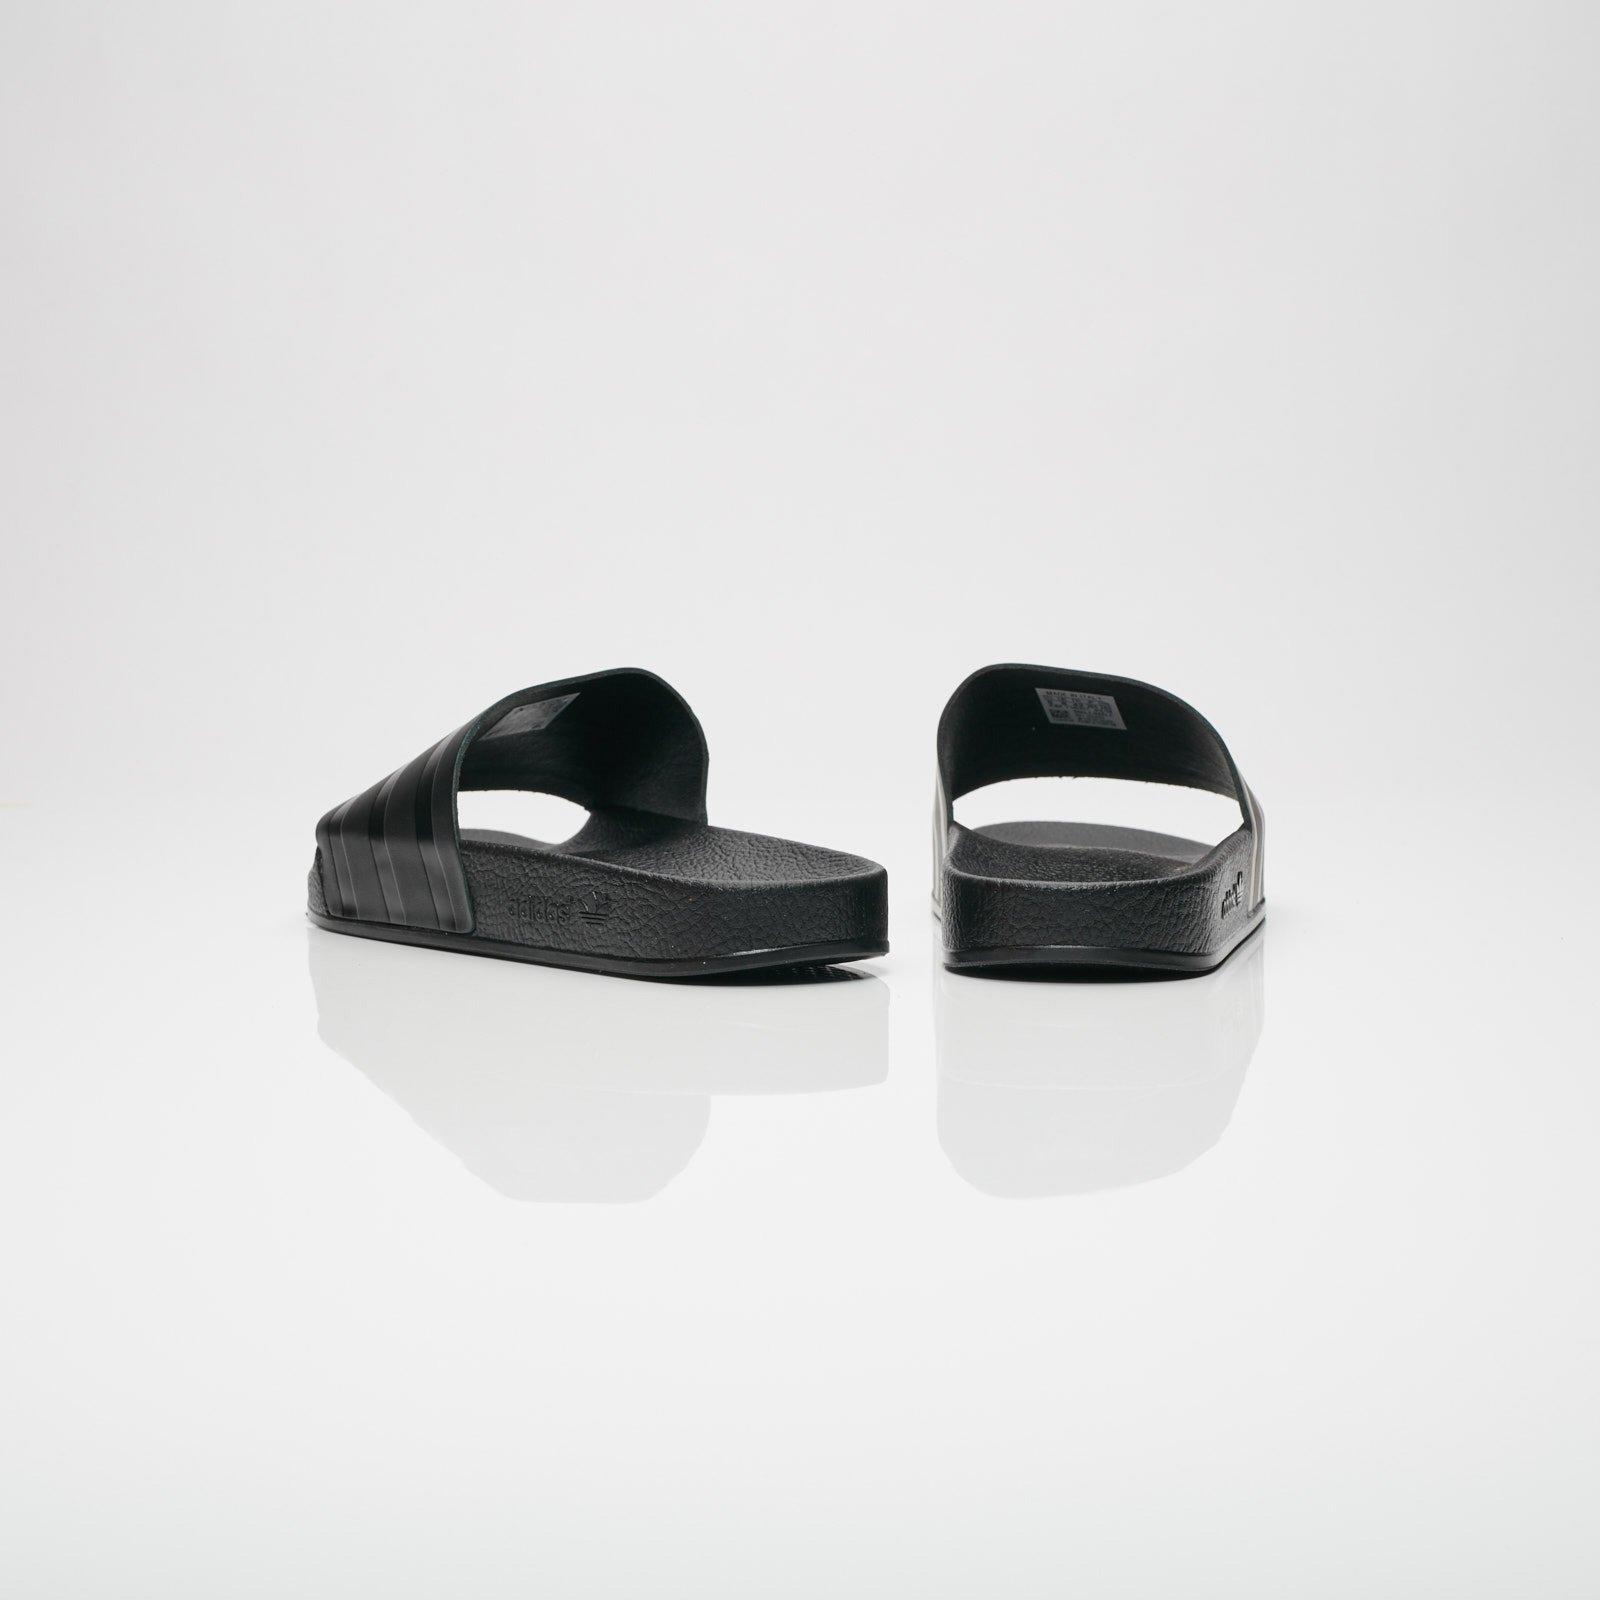 best sneakers 5ed38 bc75b adidas Adilette - Cq3094 - Sneakersnstuff   sneakers   streetwear online  since 1999